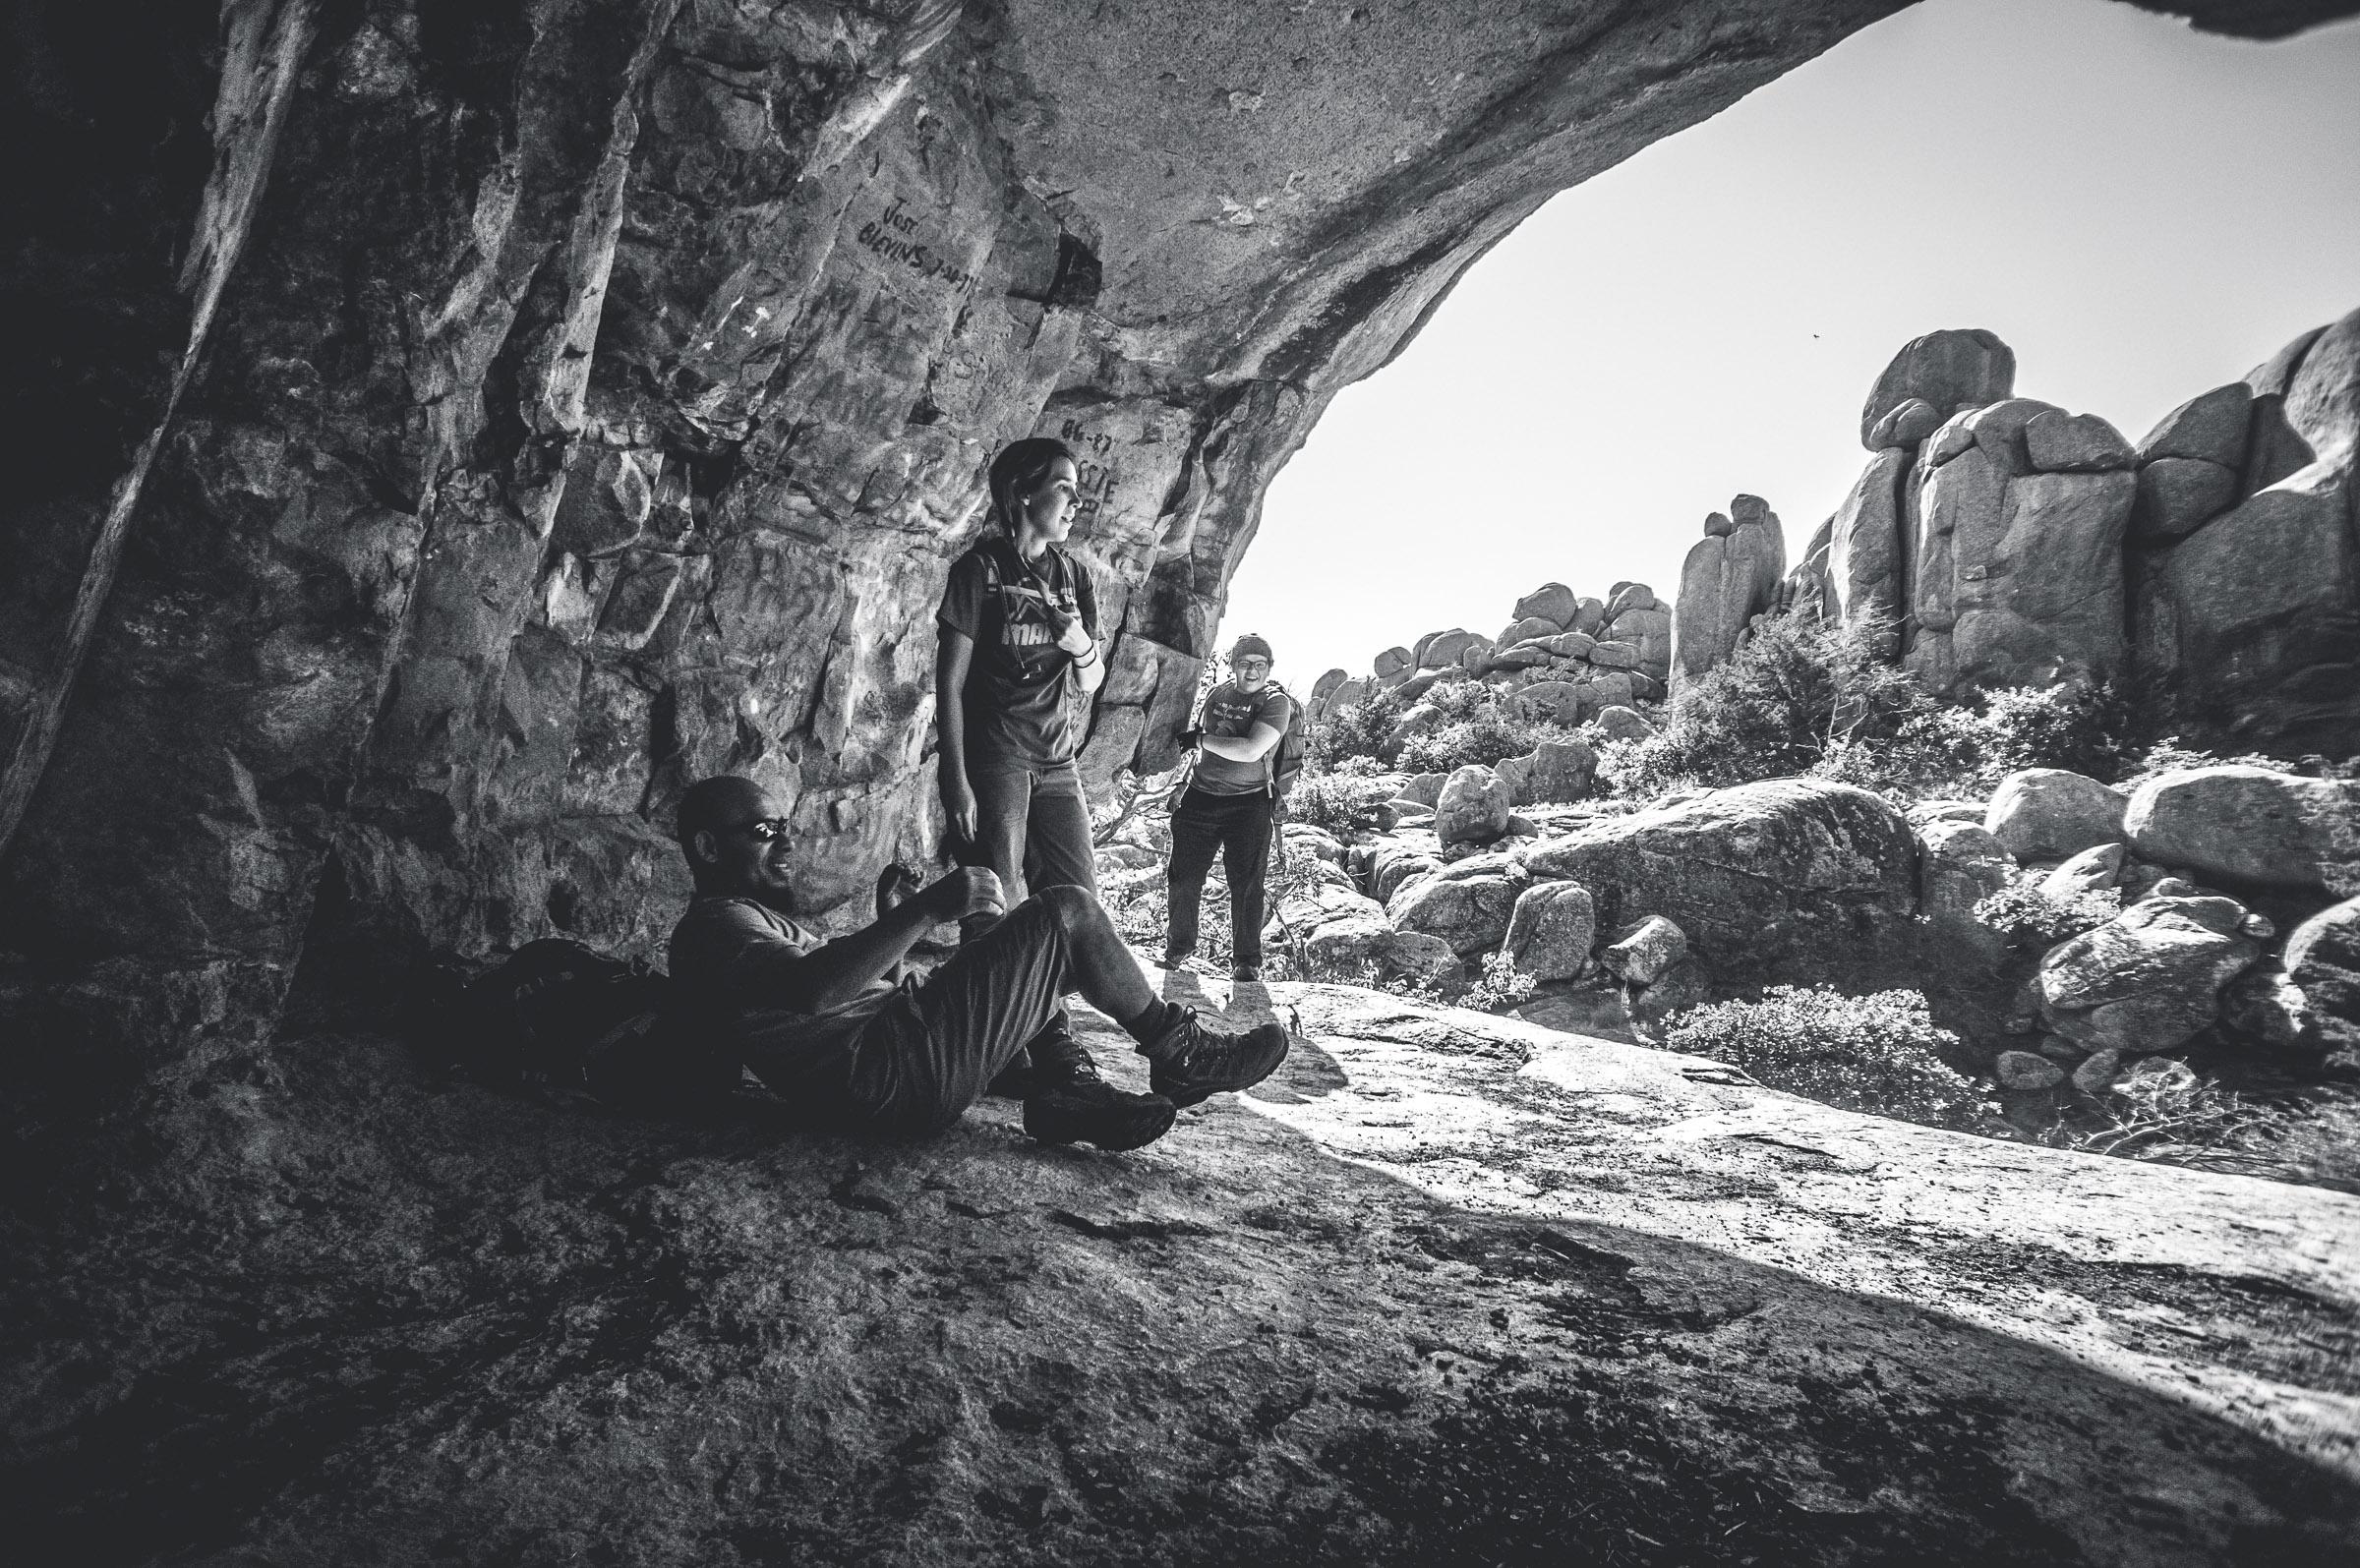 Spanish Cave 11-12-16 B&W (15 of 33).JPG